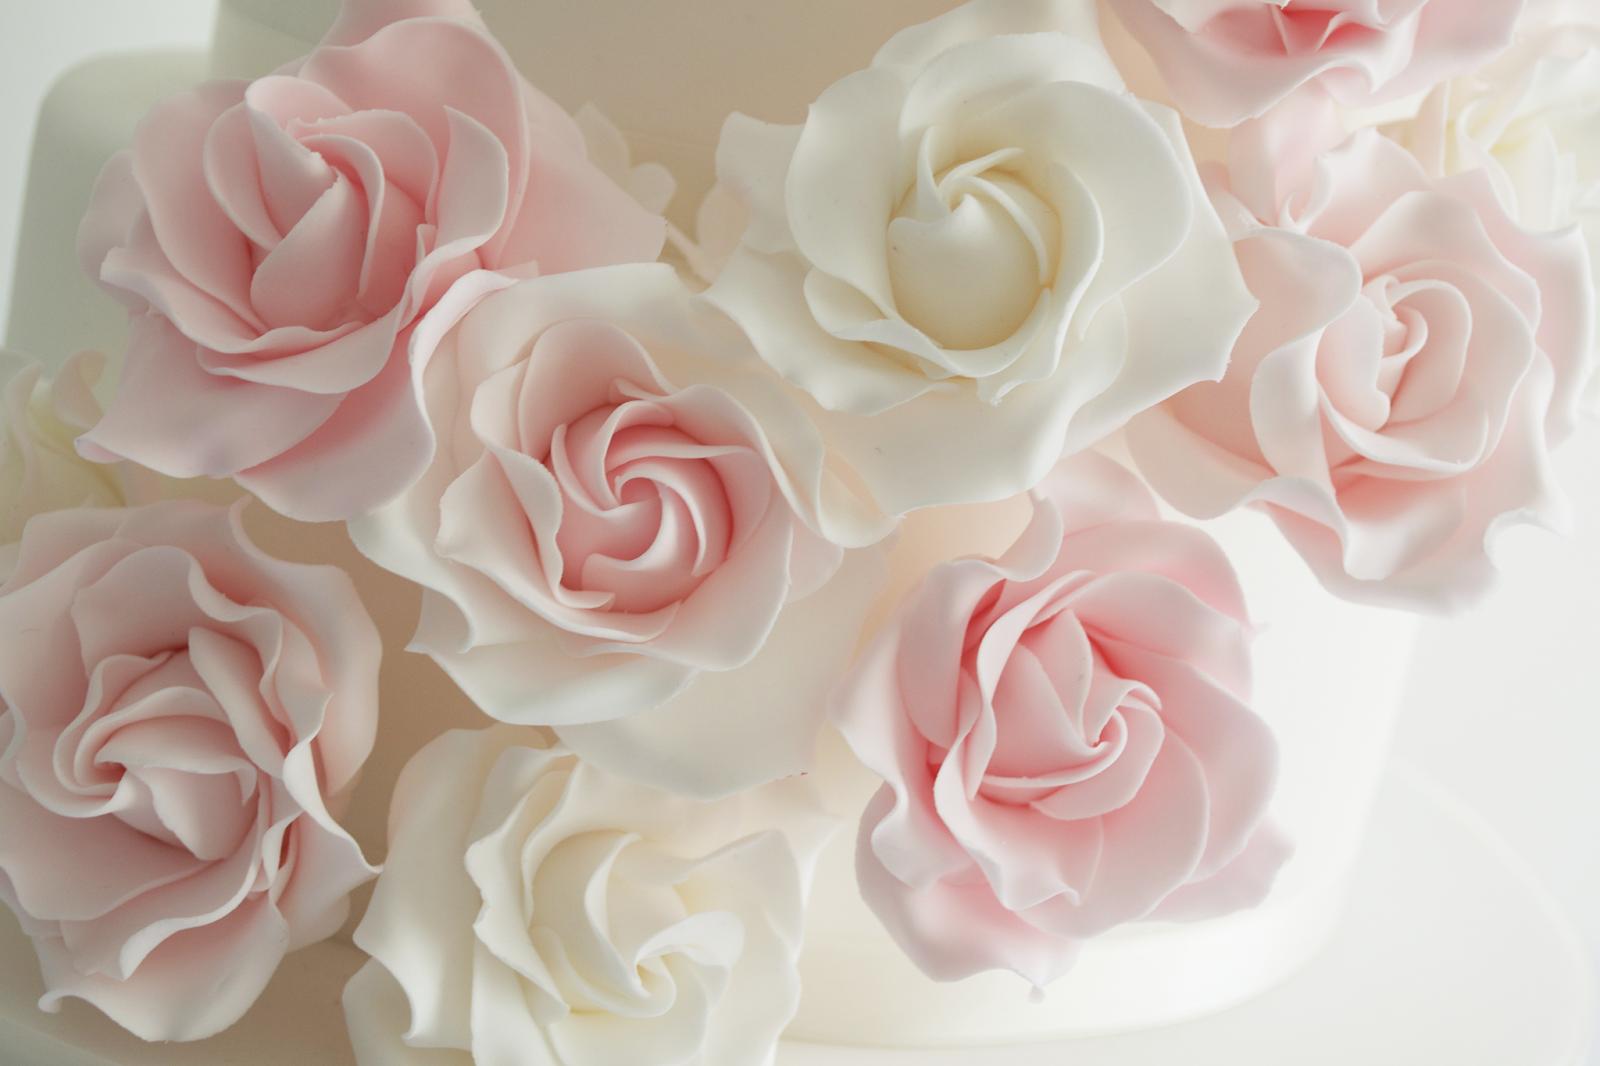 white wallpaper with pink roses wallpapersafari